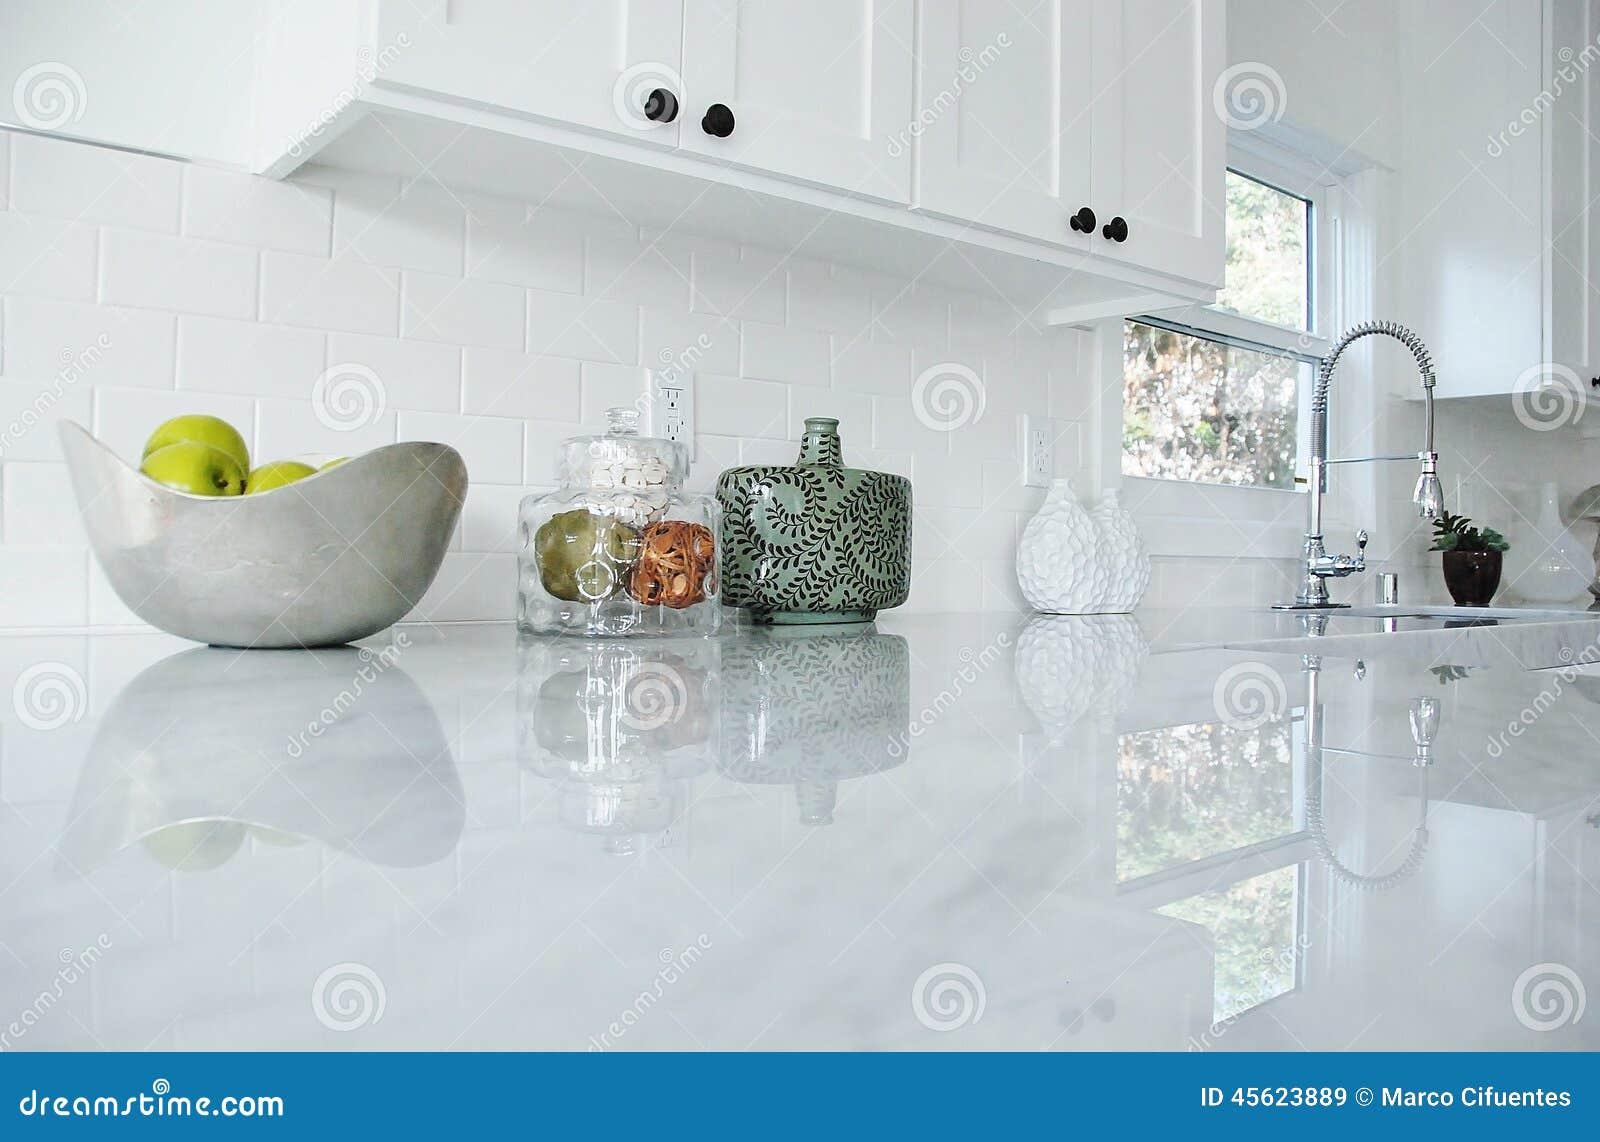 Glass countertops bathroom - Kitchen Counter Stock Photo Image 45623889